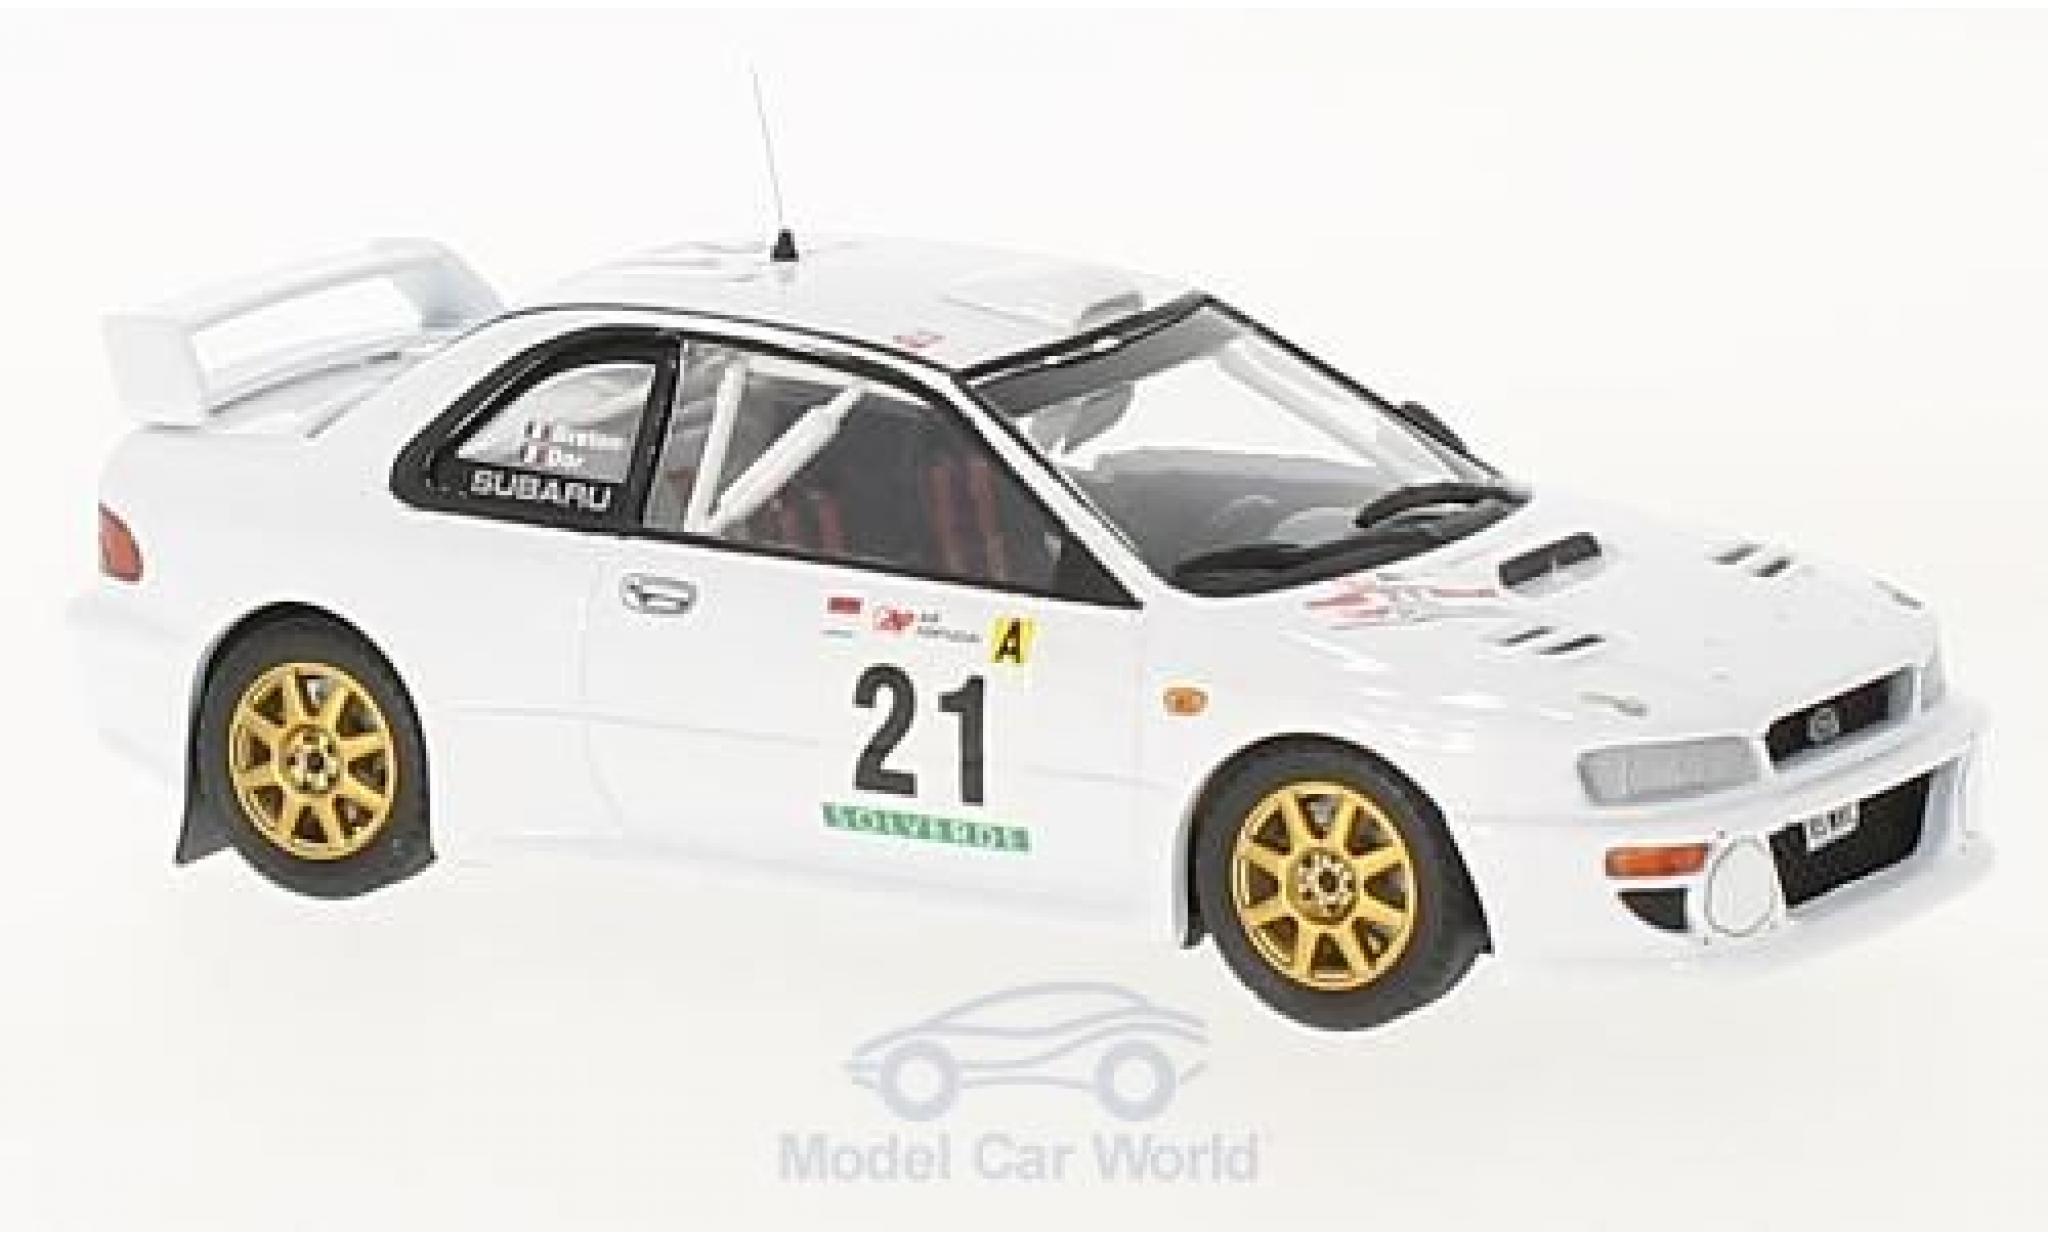 Subaru Impreza WRC 1/43 Trofeu WRC No.21 Rallye WM Rallye Portugal 1999 F. Dor/D. Breton